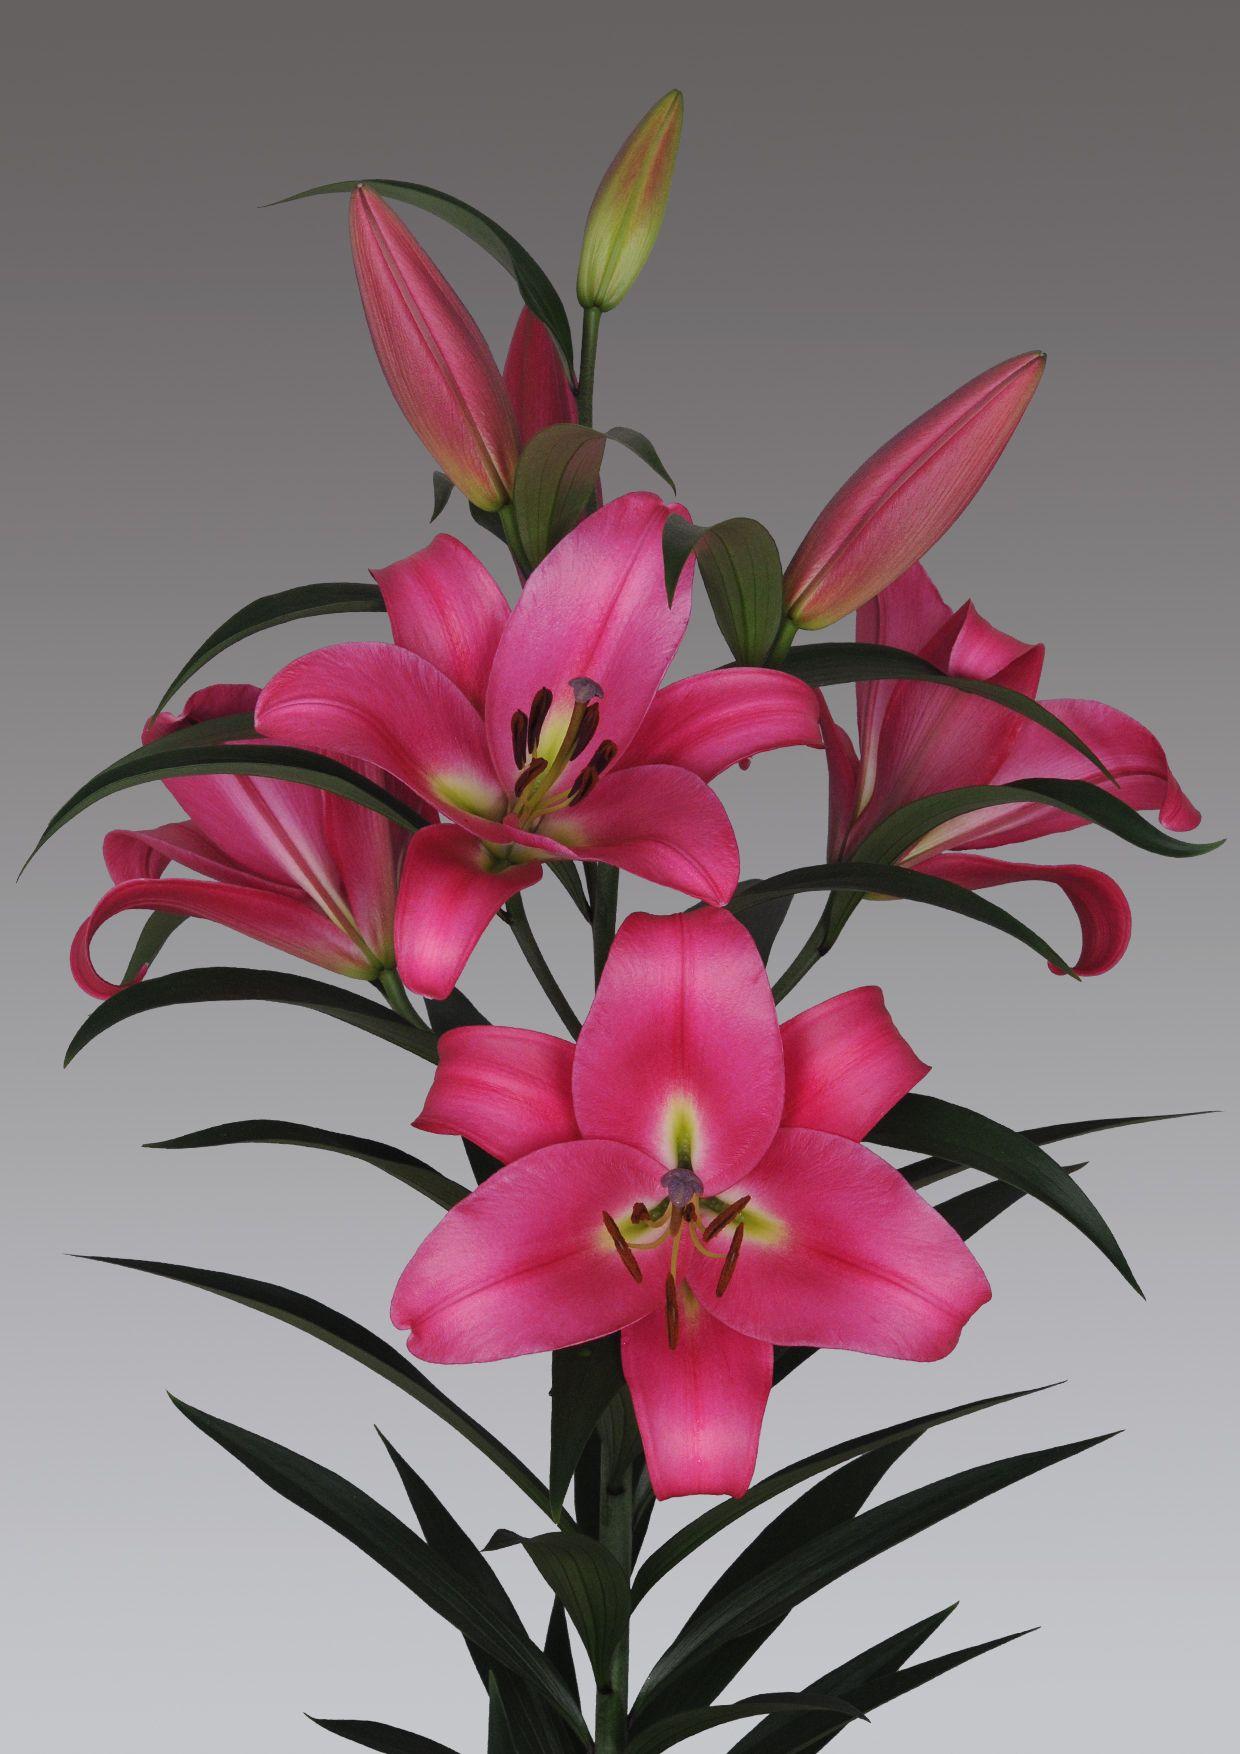 Pink Lily Profundo Lilium Profundo Pinterest Lilium